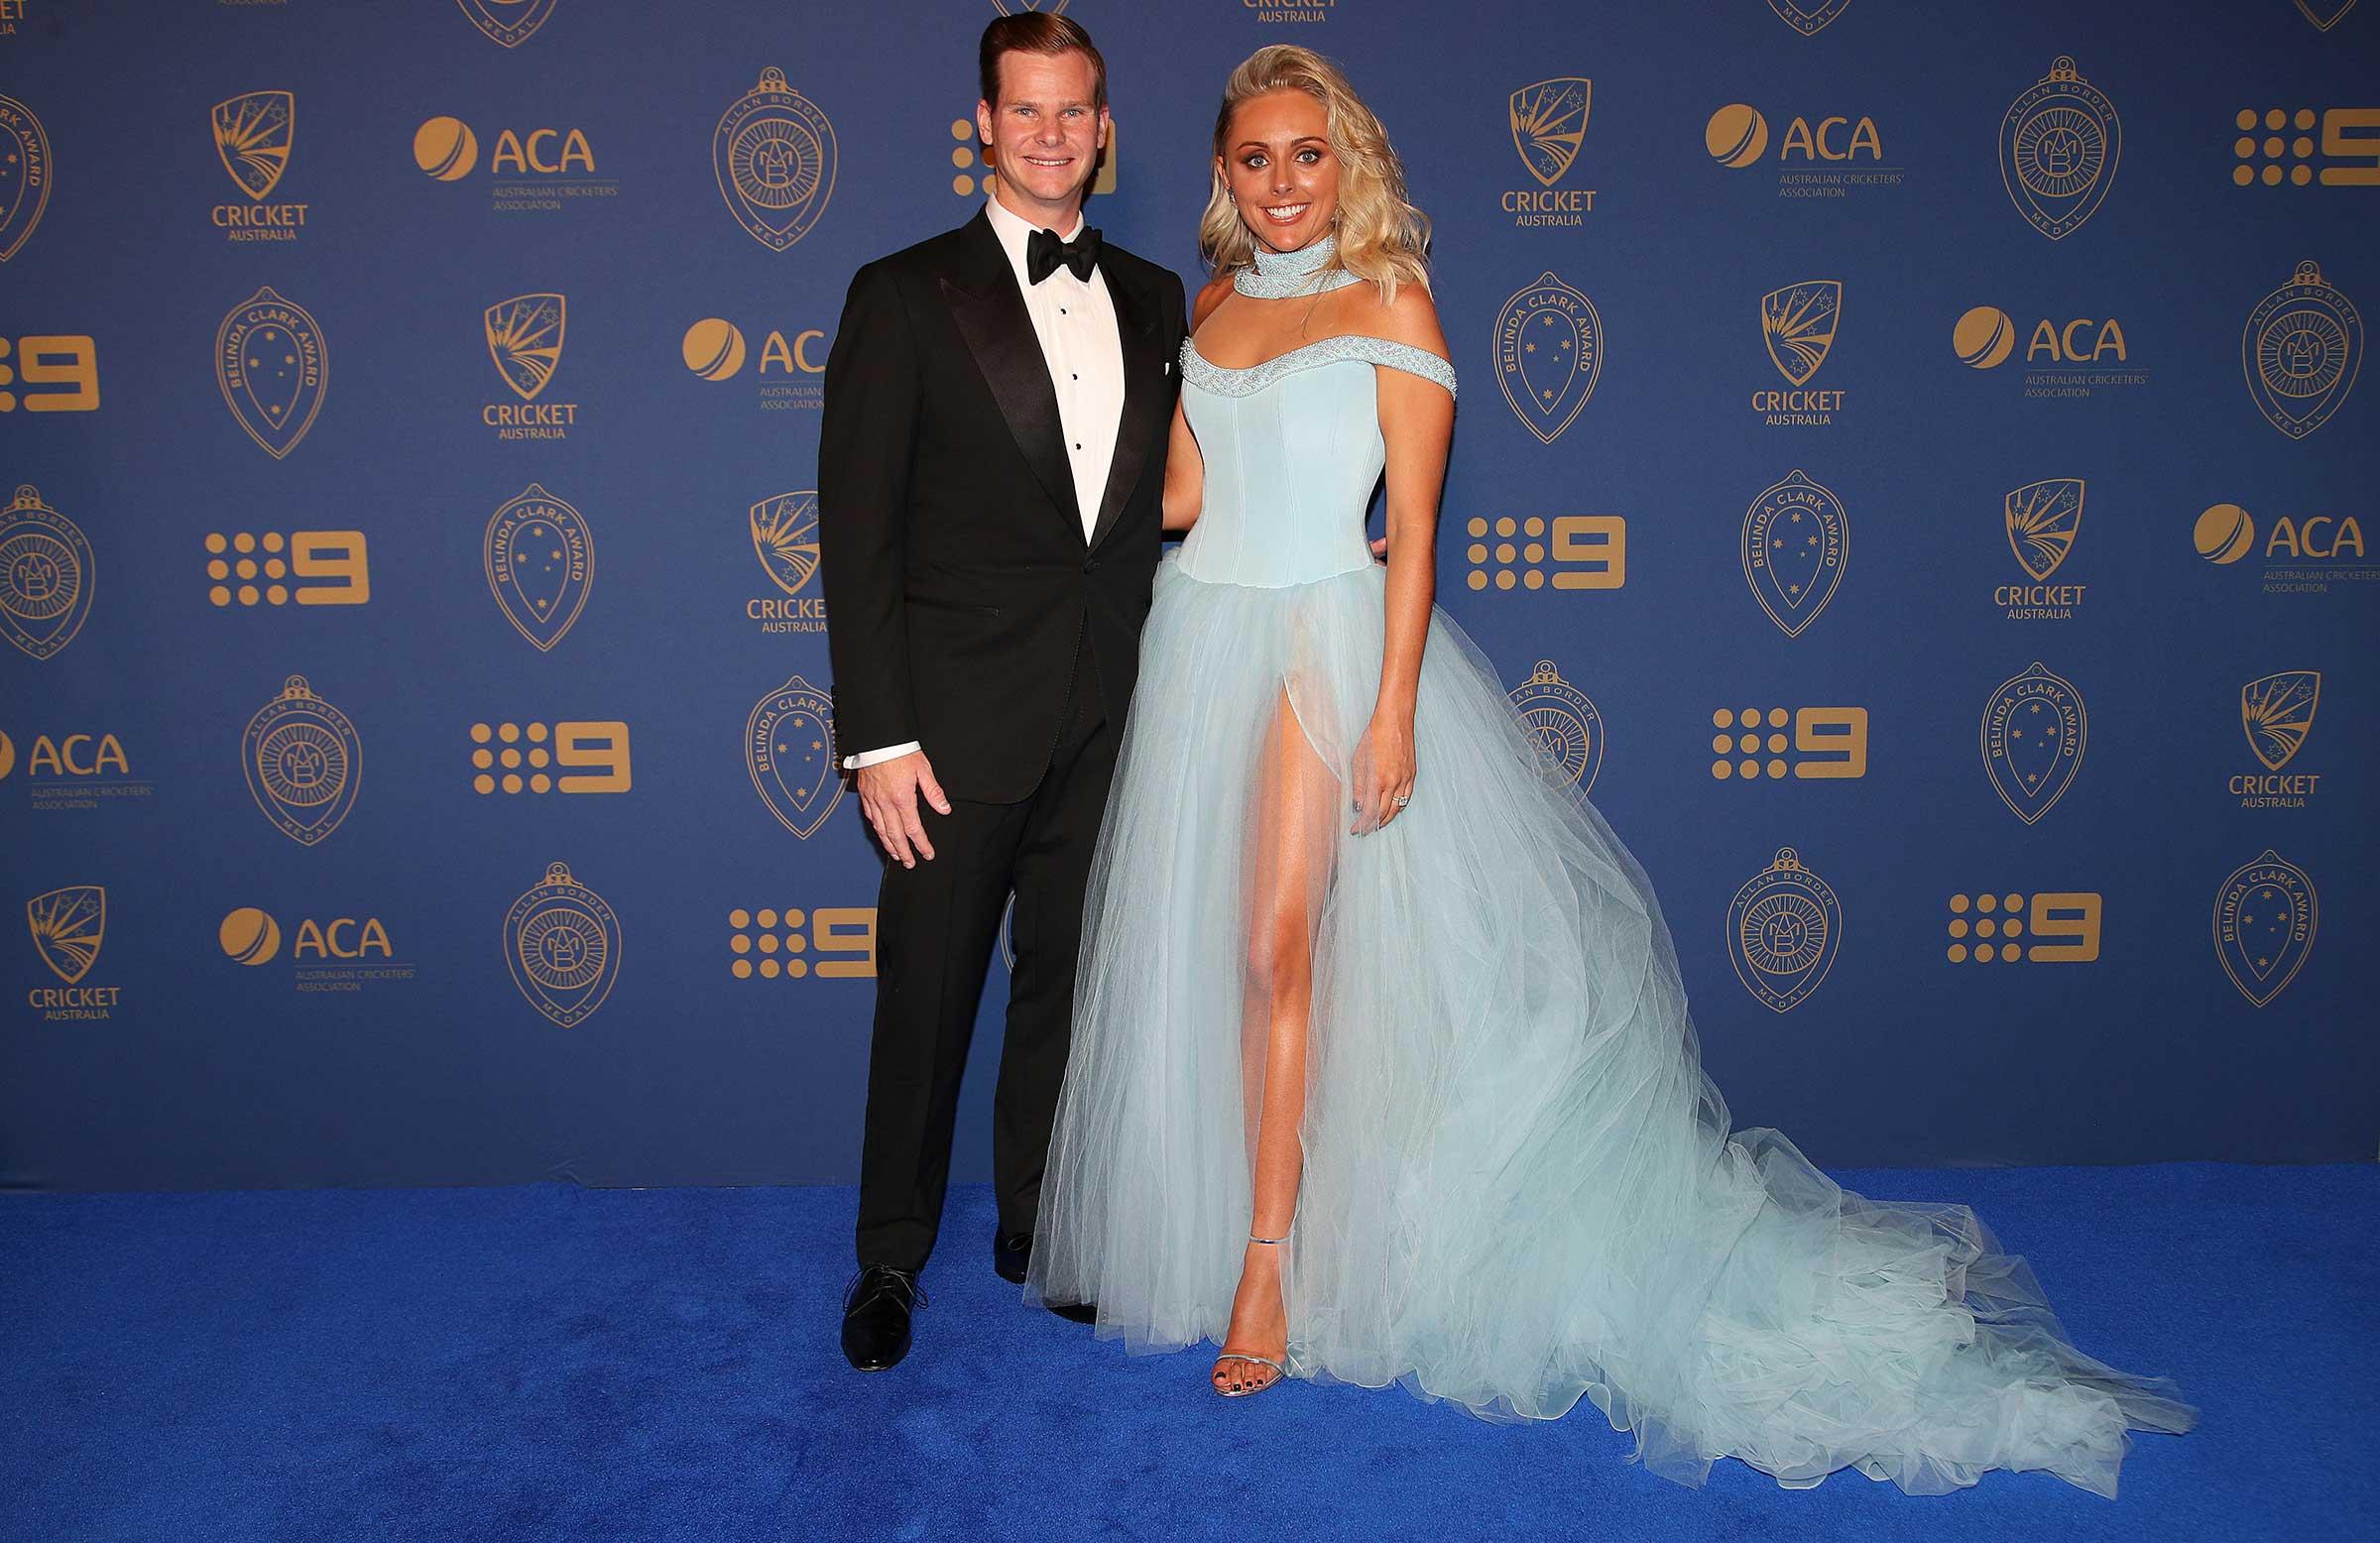 Australia captain Steve Smith and fiancée Dani Willis // Getty